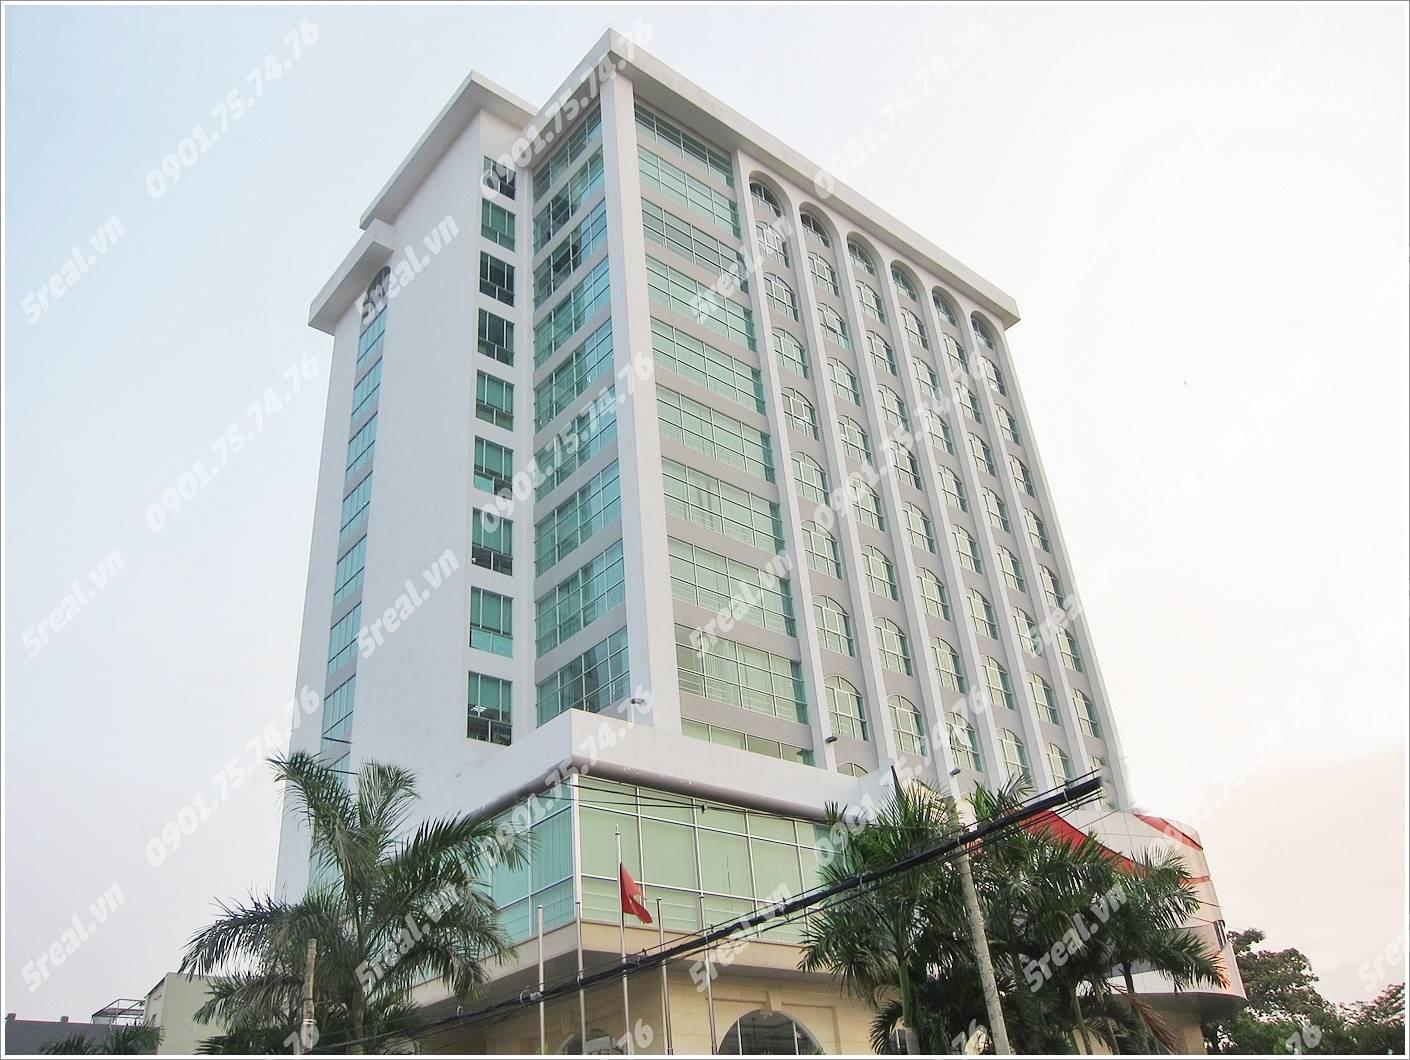 bao-phu-nu-building-nguyen-dang-giai-quan-2-van-phong-cho-thue-tphcm-5real.vn-02